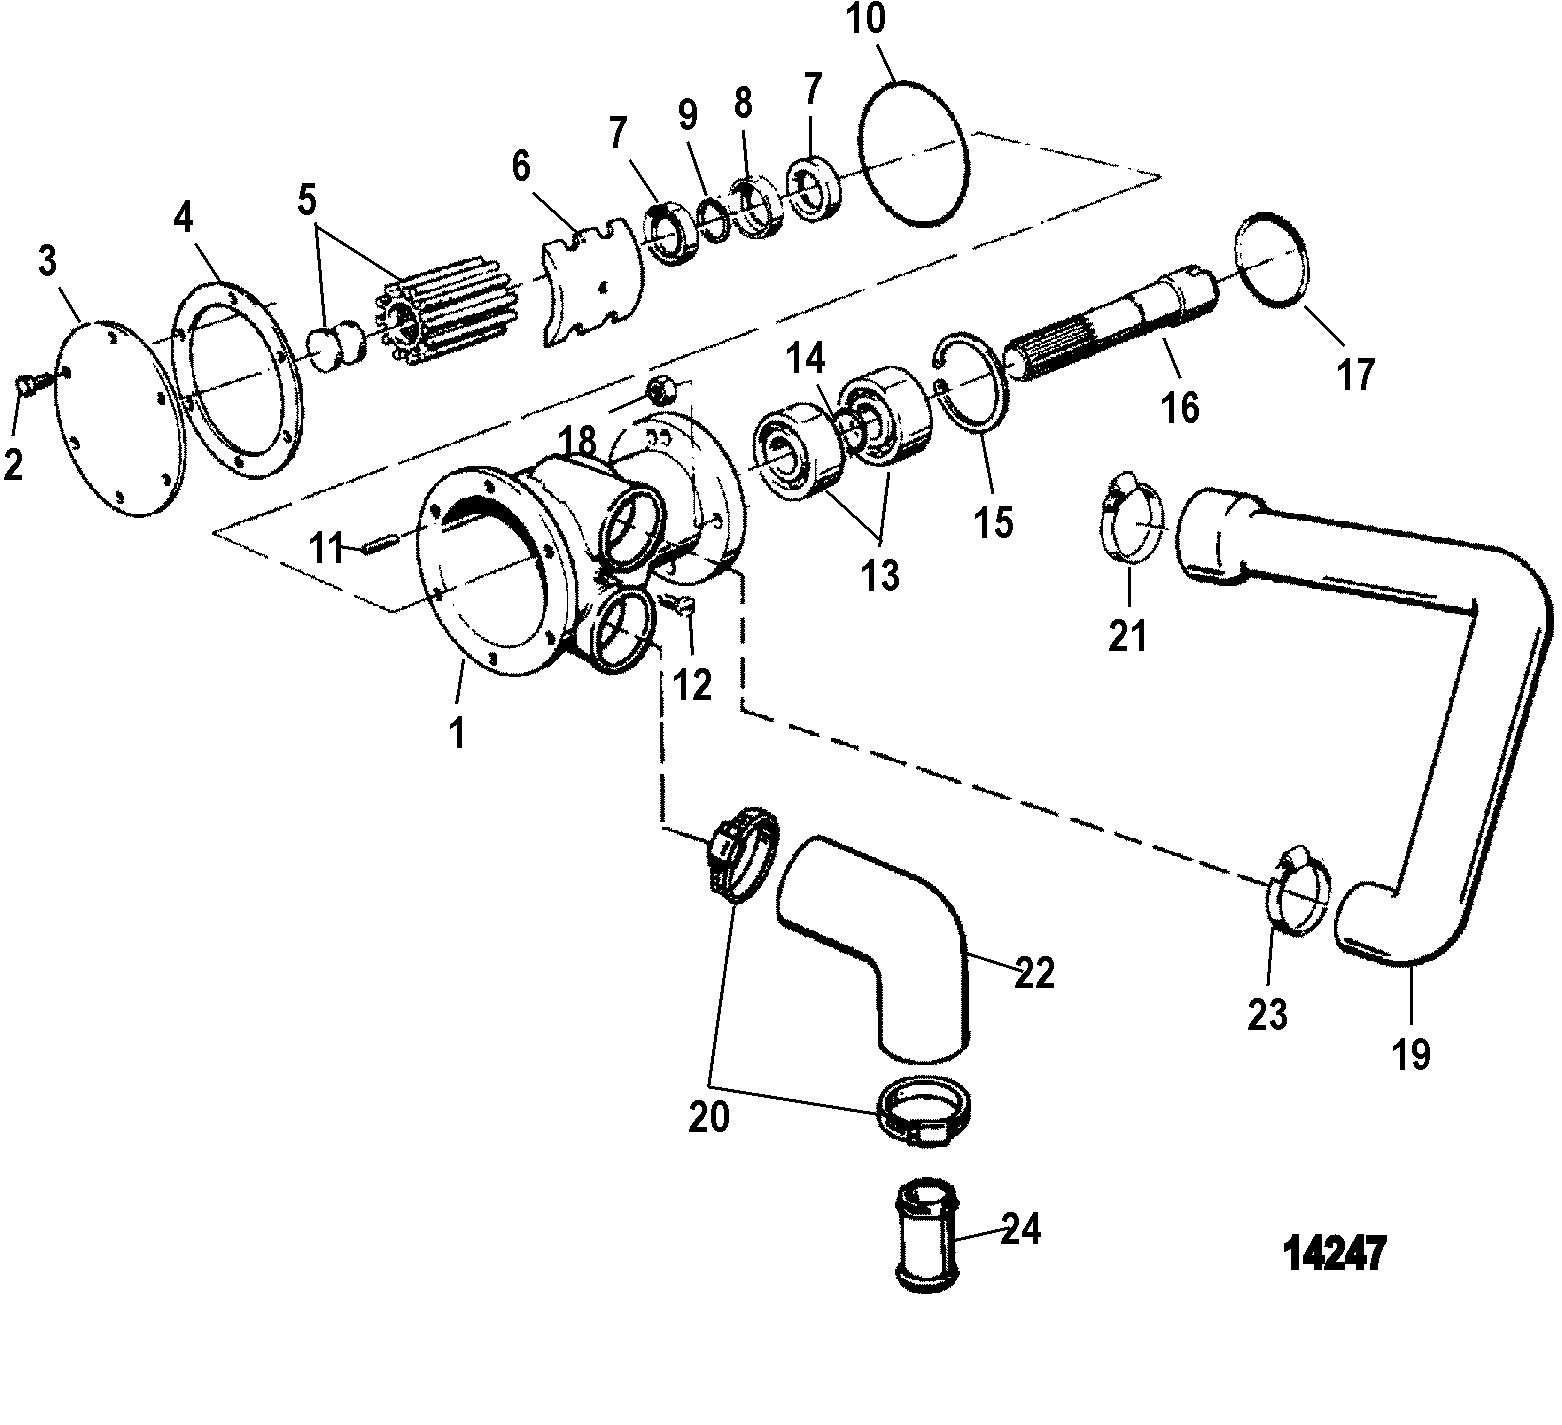 mercruiser 7 3 d tronic manual